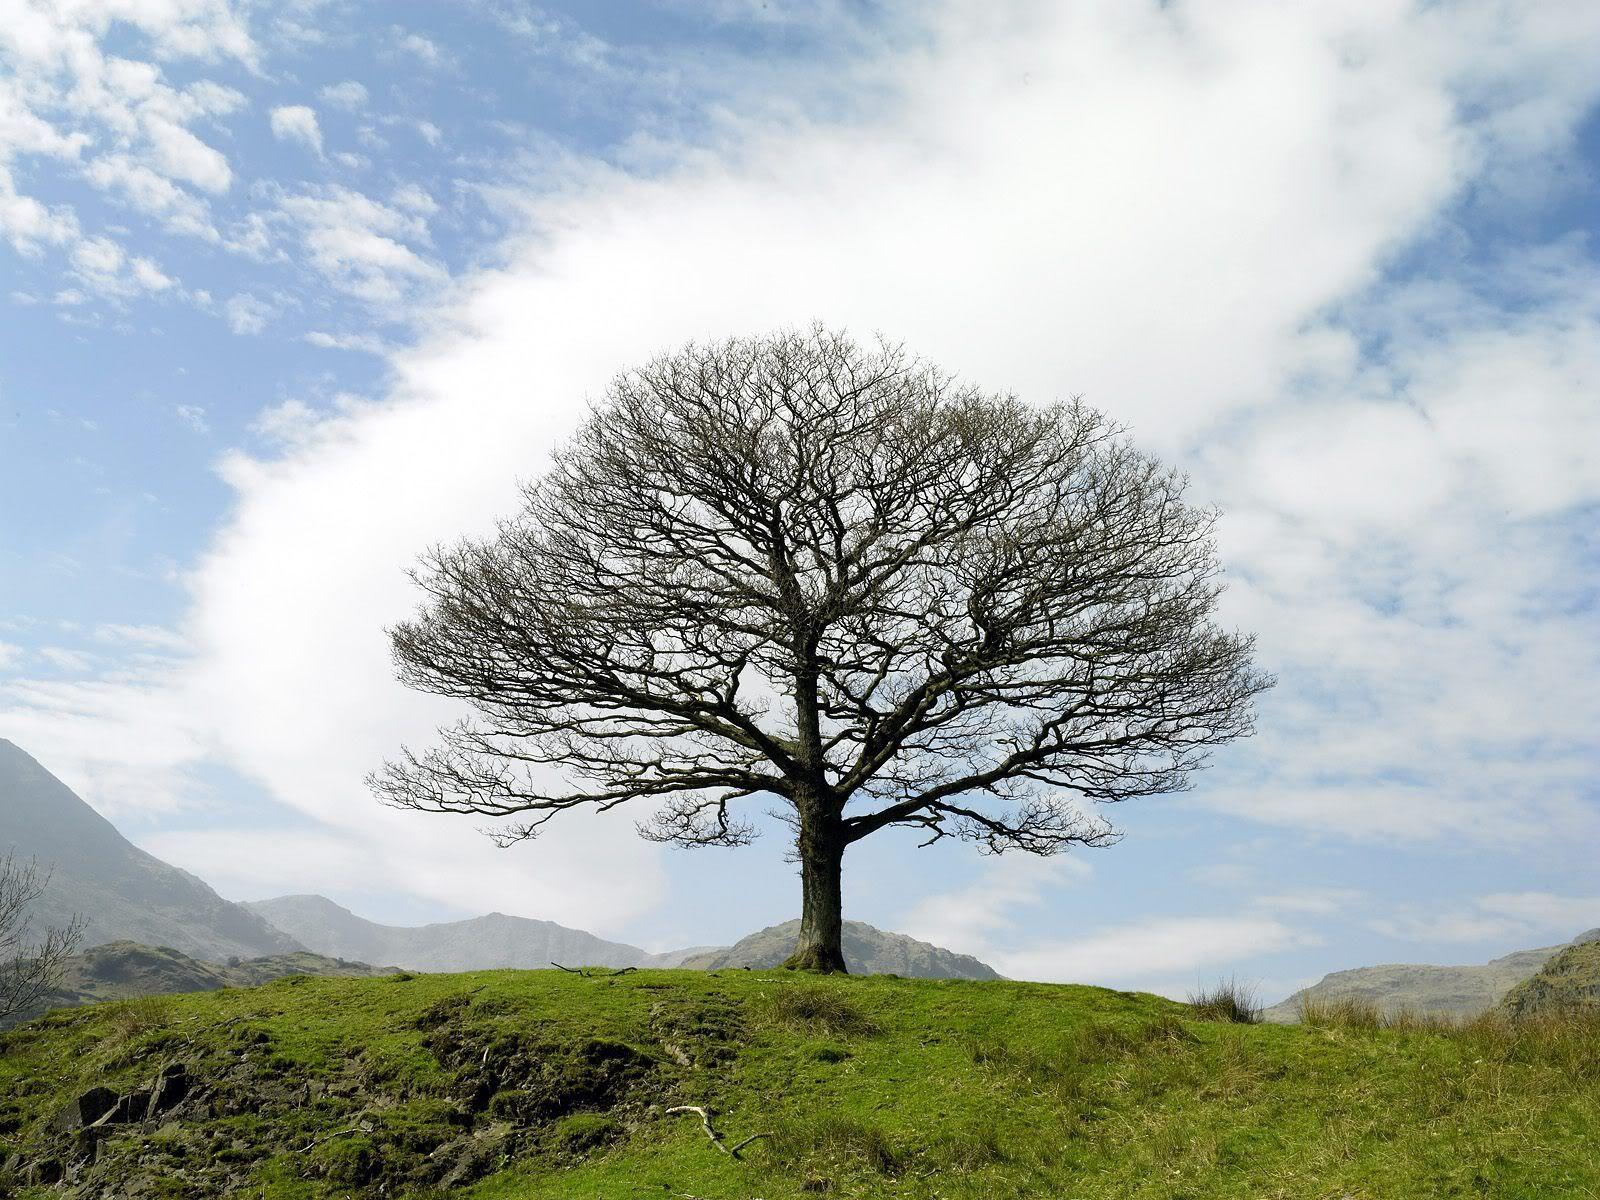 trees photo: Trees SingleTreeLakeDistrictNearLittleLan.jpg